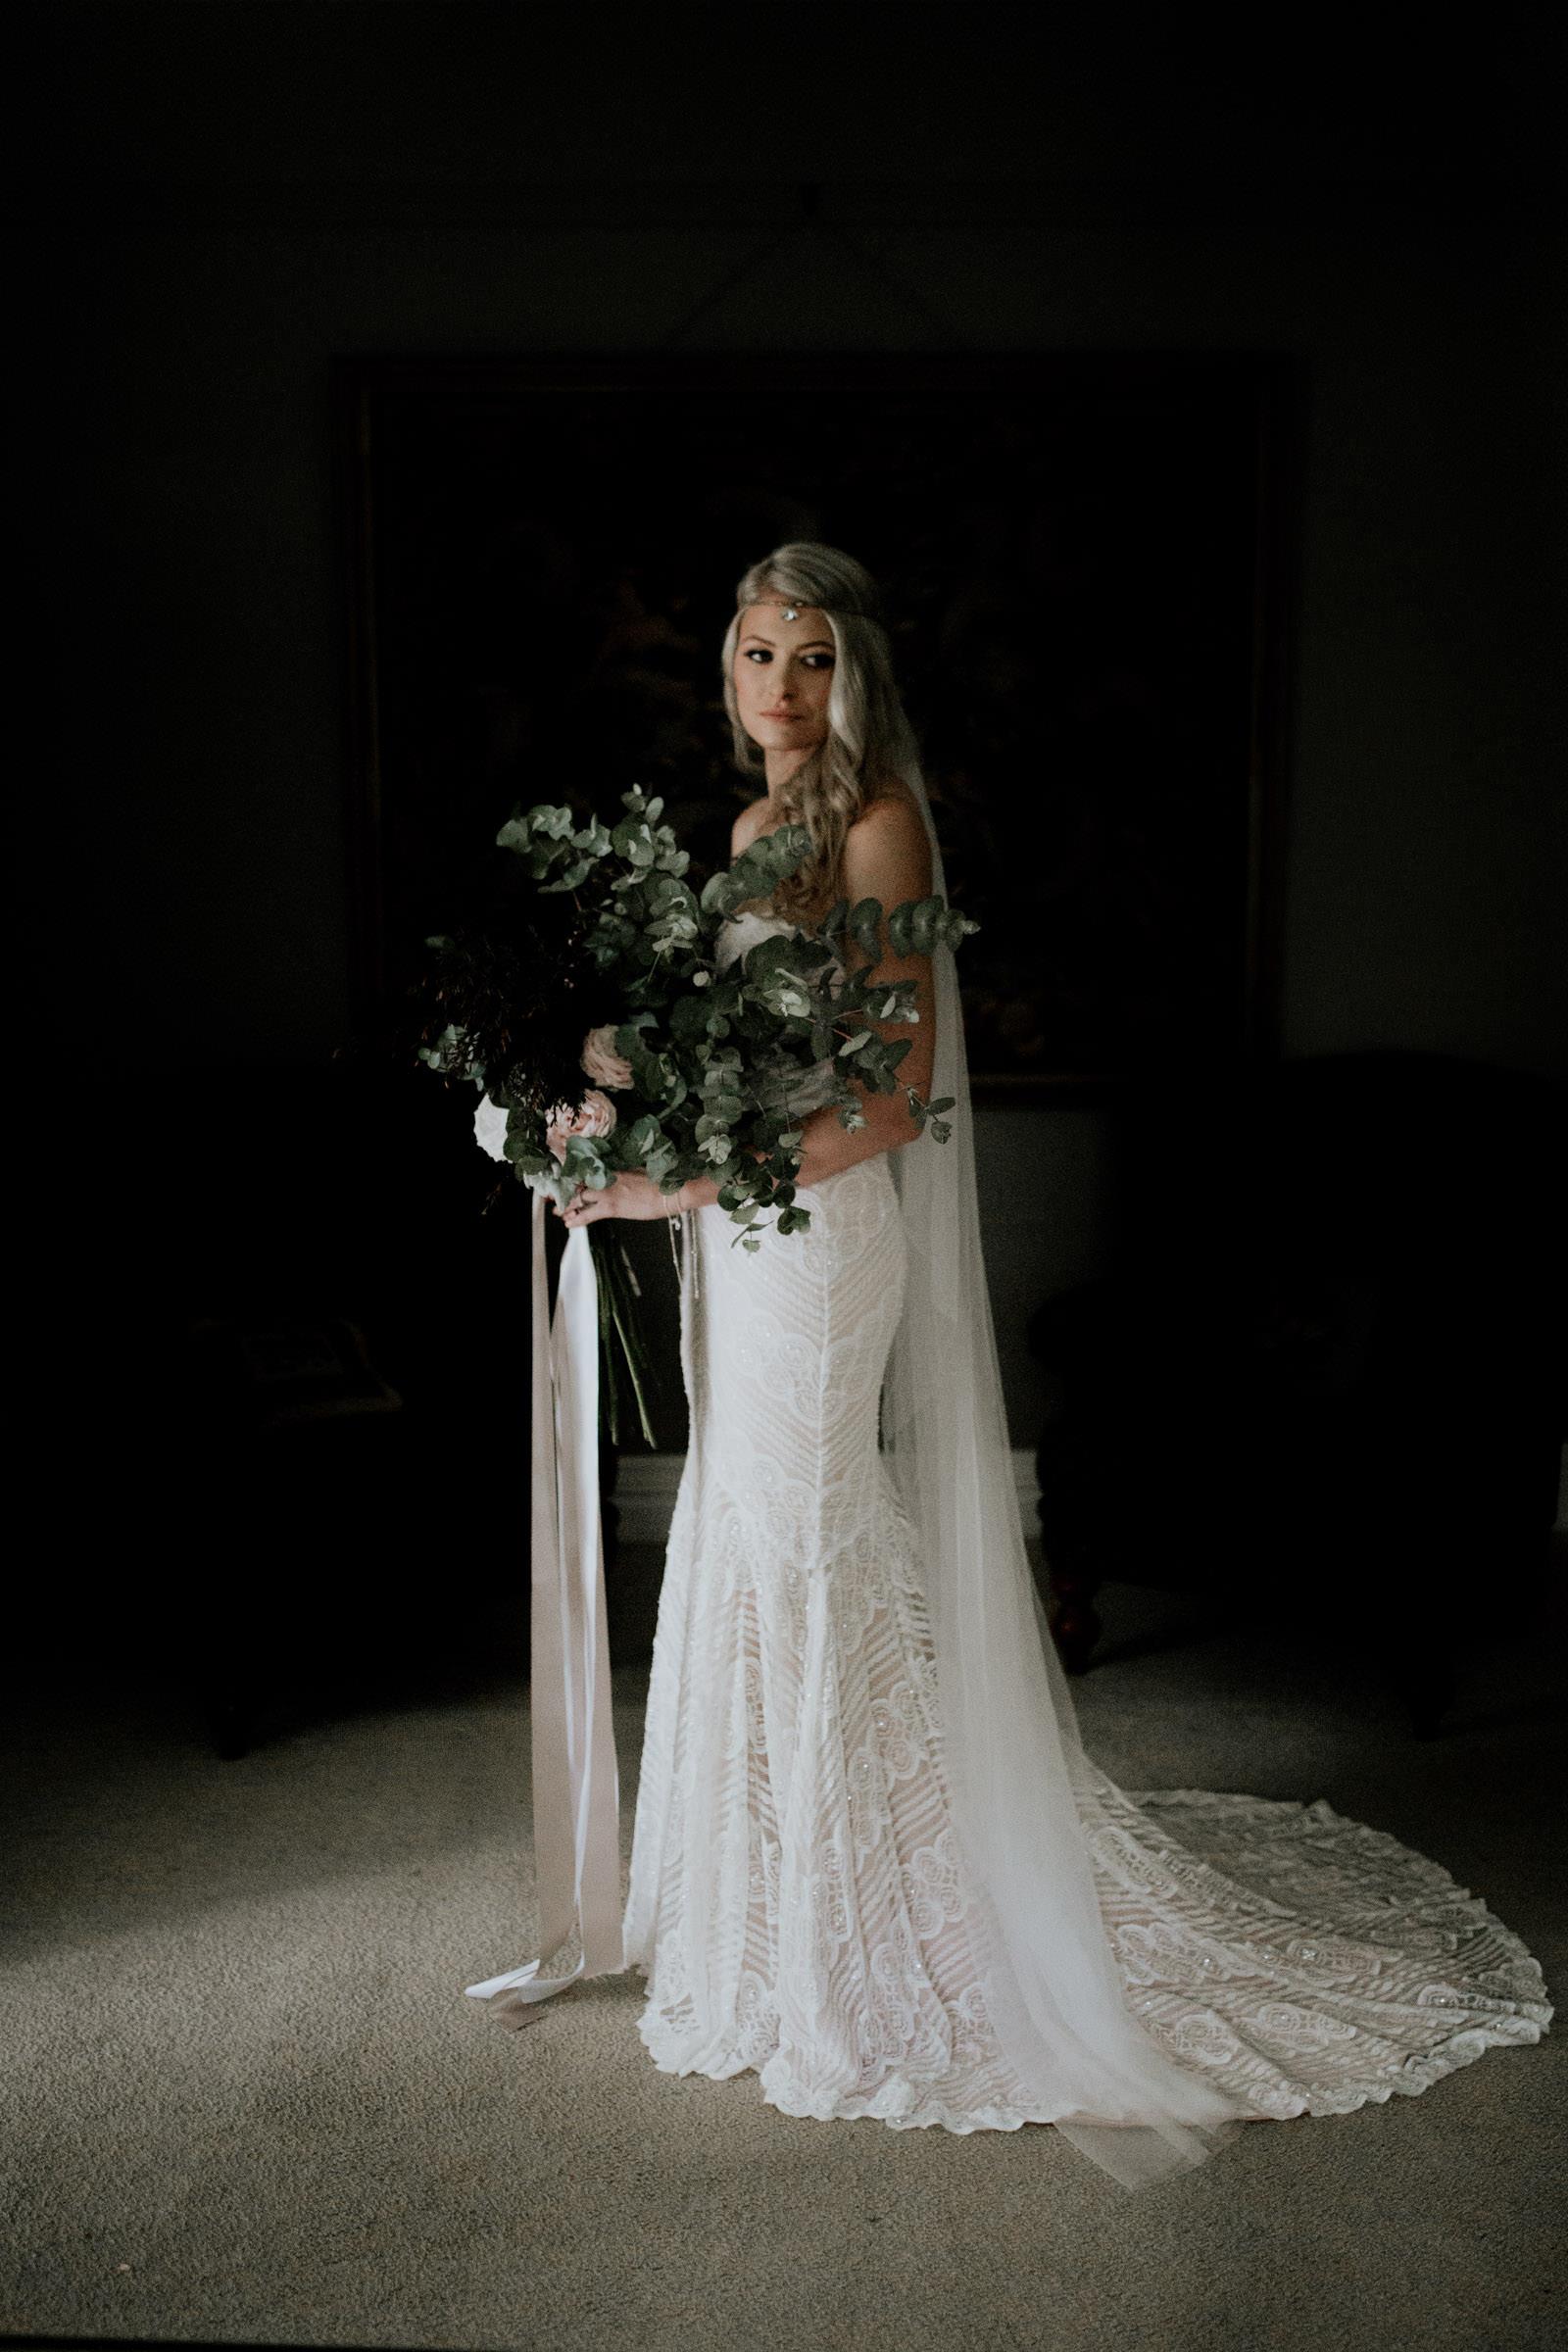 Emma+John+Far+South+Coast+Wedding+Festivl+Glamping+Bush-51.jpg